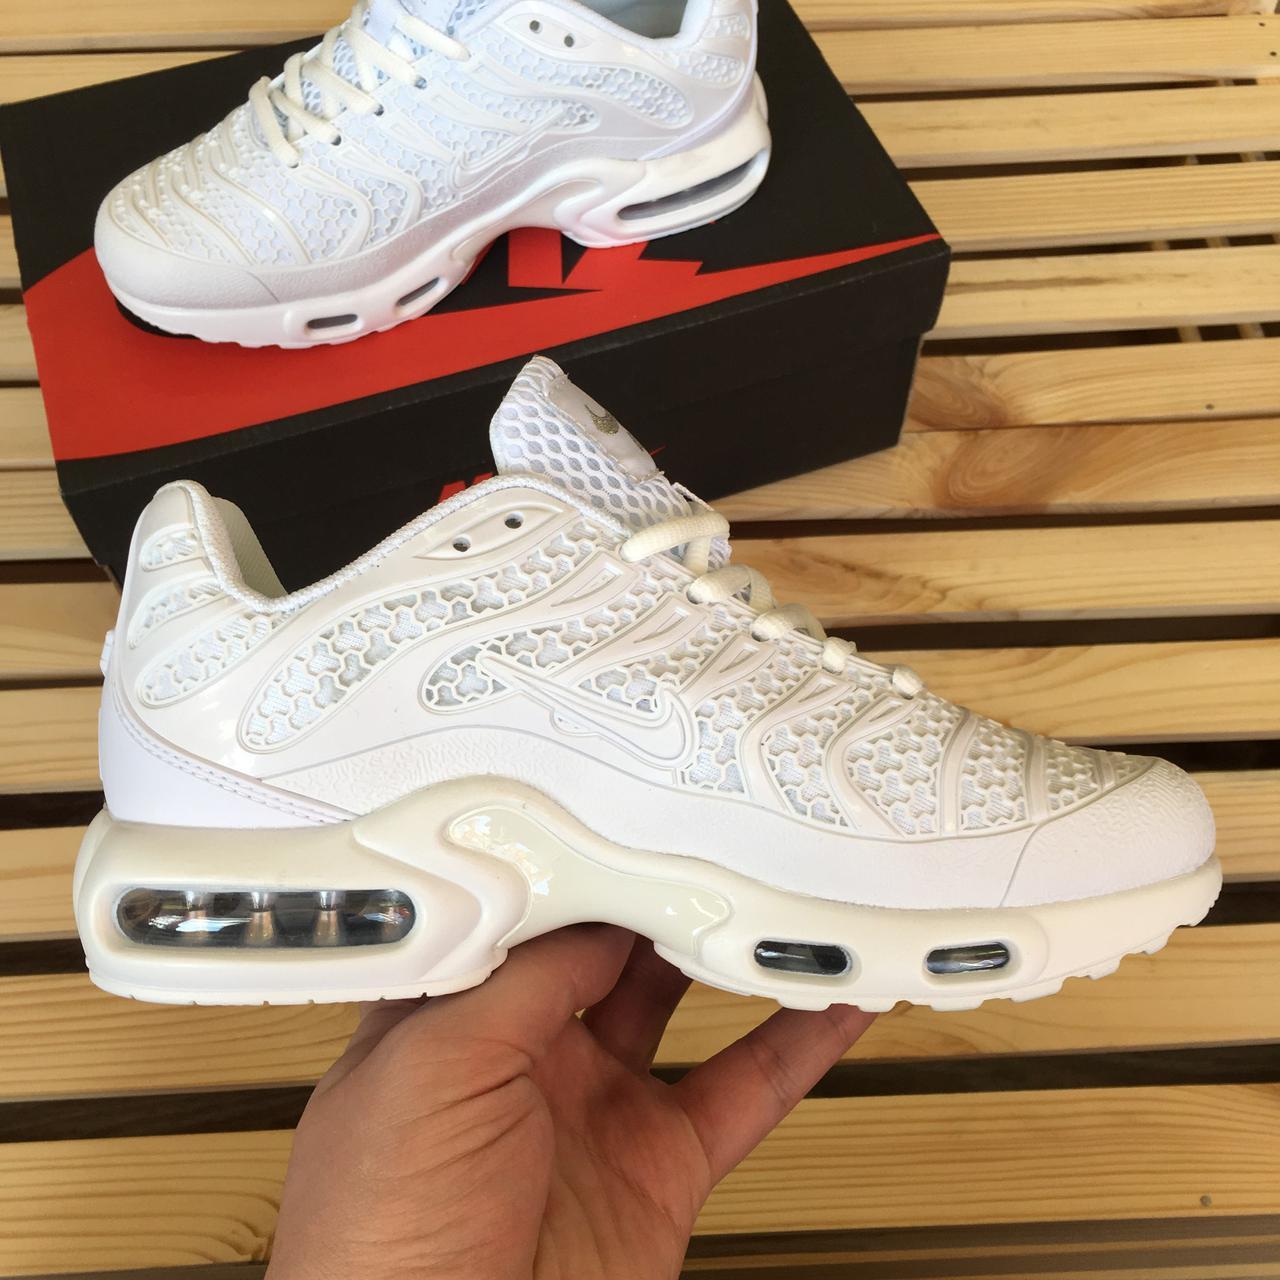 20b44072eb7516 Женские кроссовки Nike Air Max TN Plus, белые, цена 1 199 грн ...